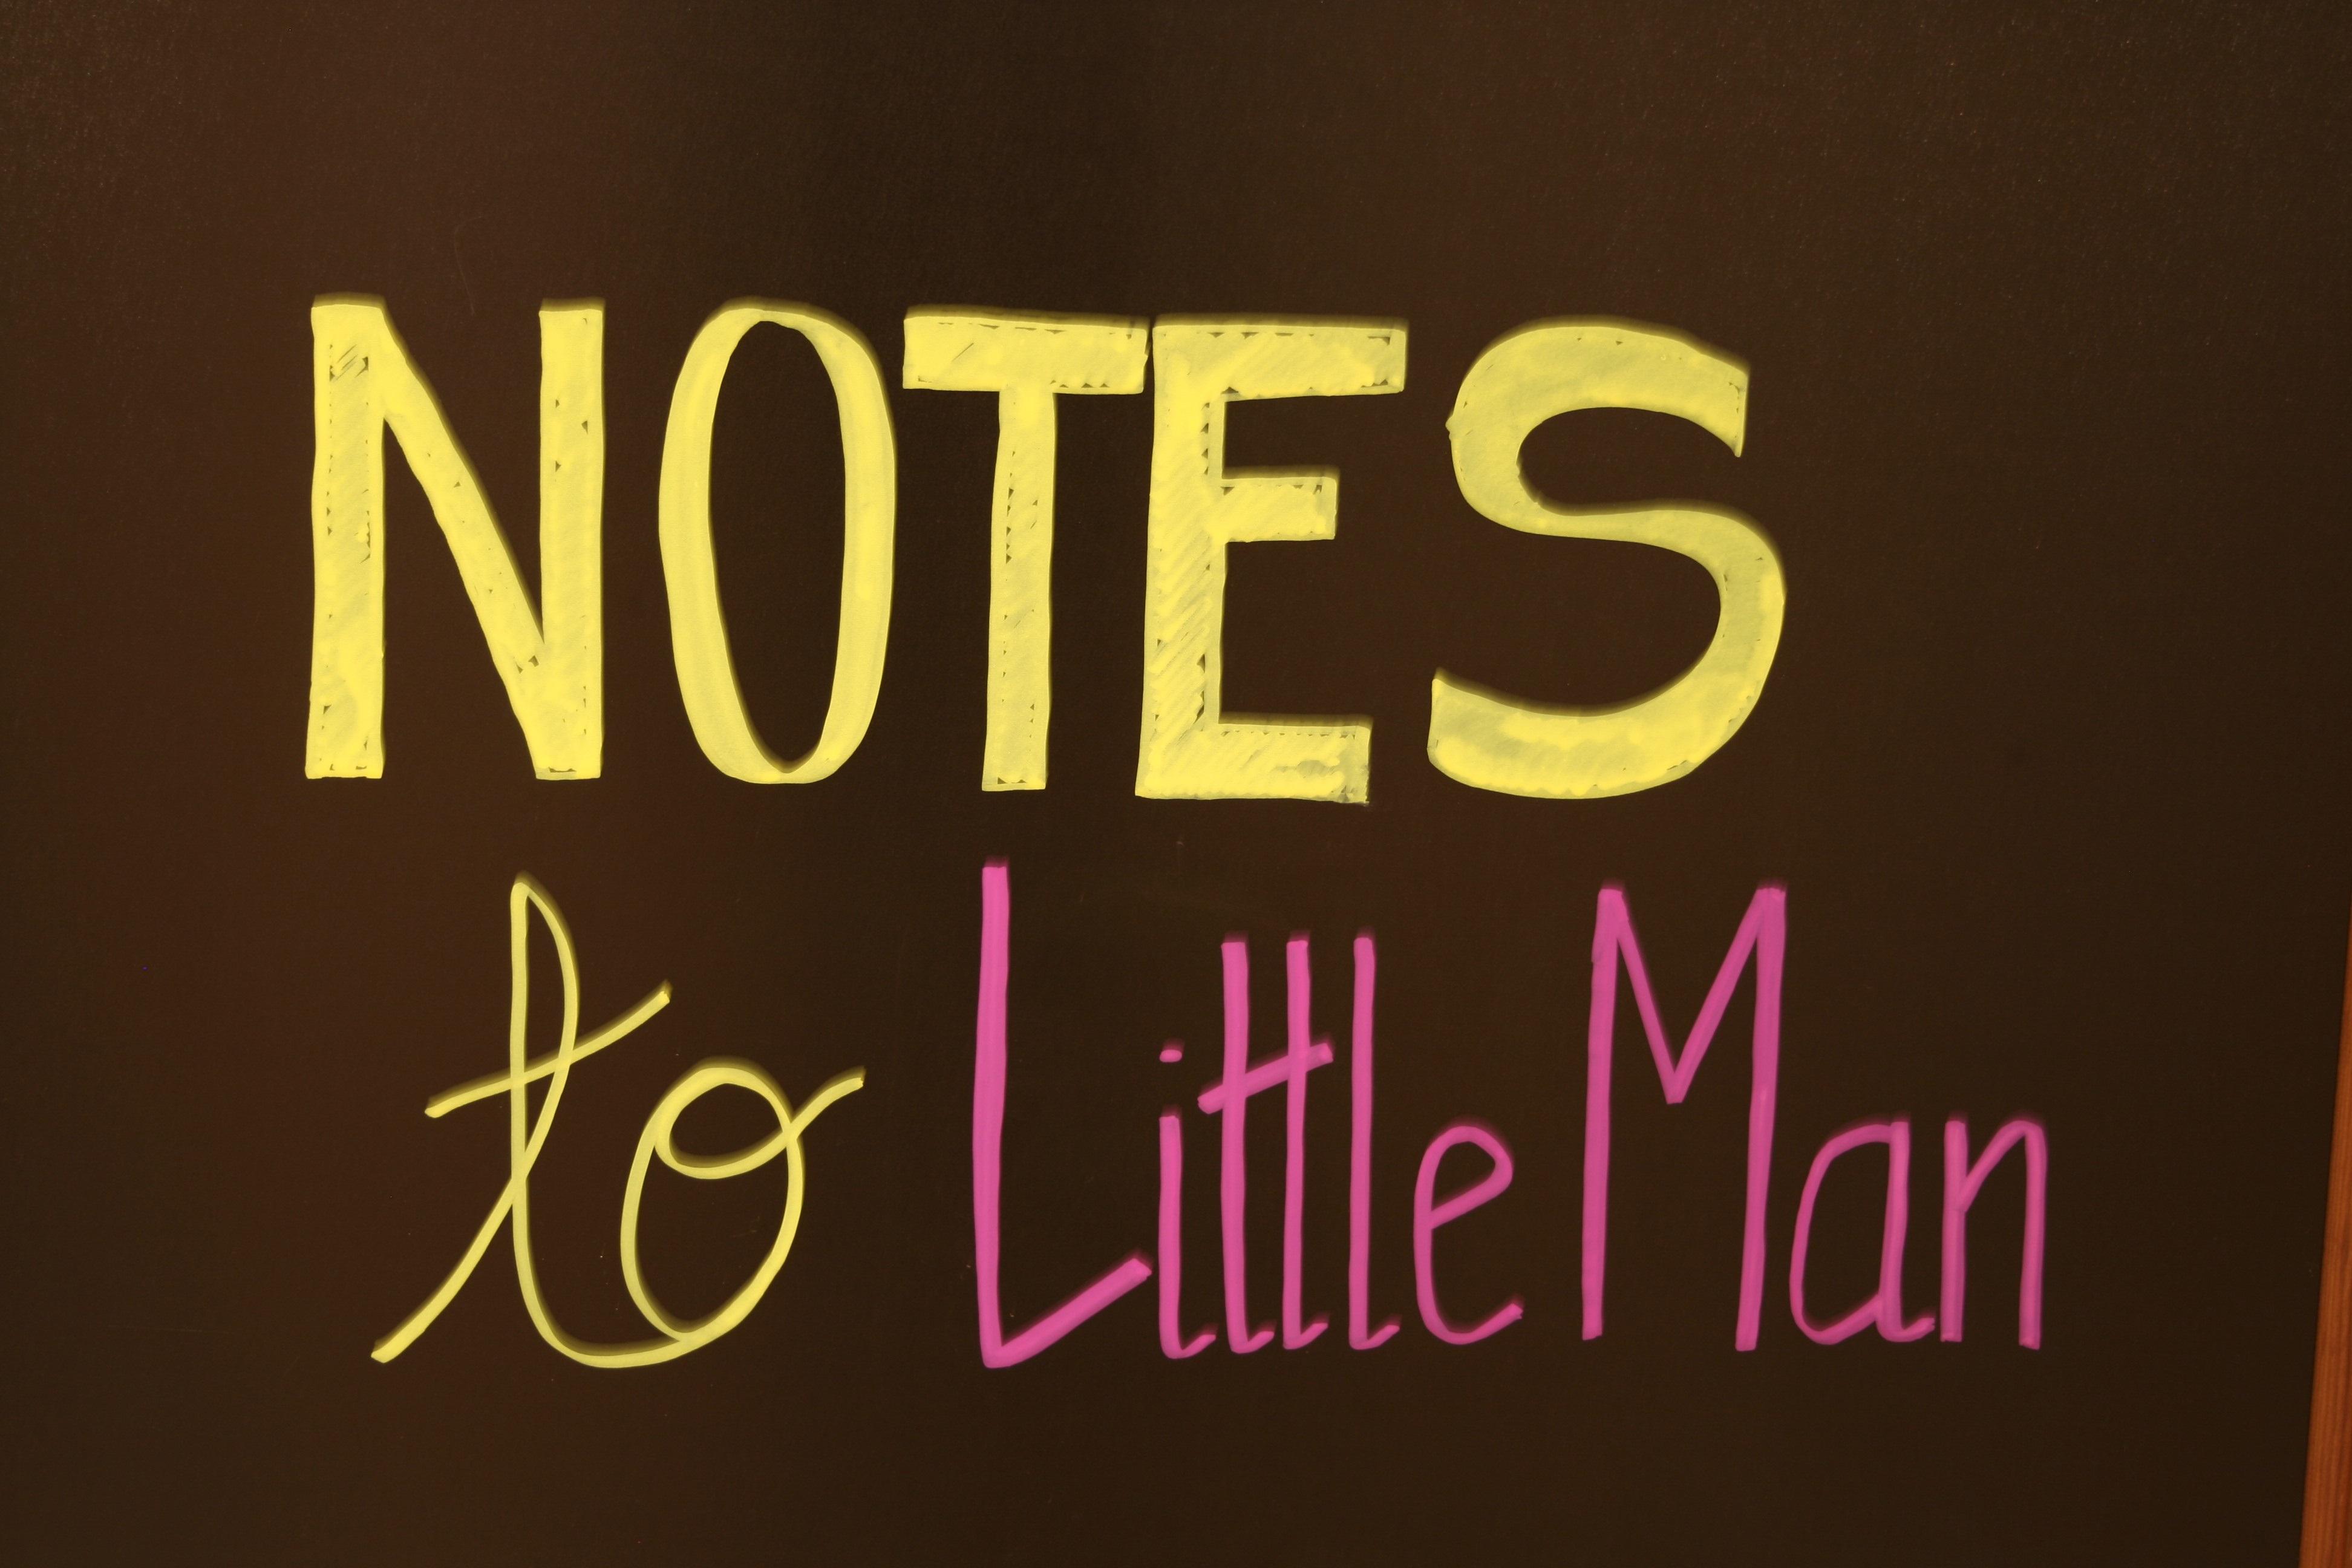 Notes to Little Man at TalesofTwoChildren.com